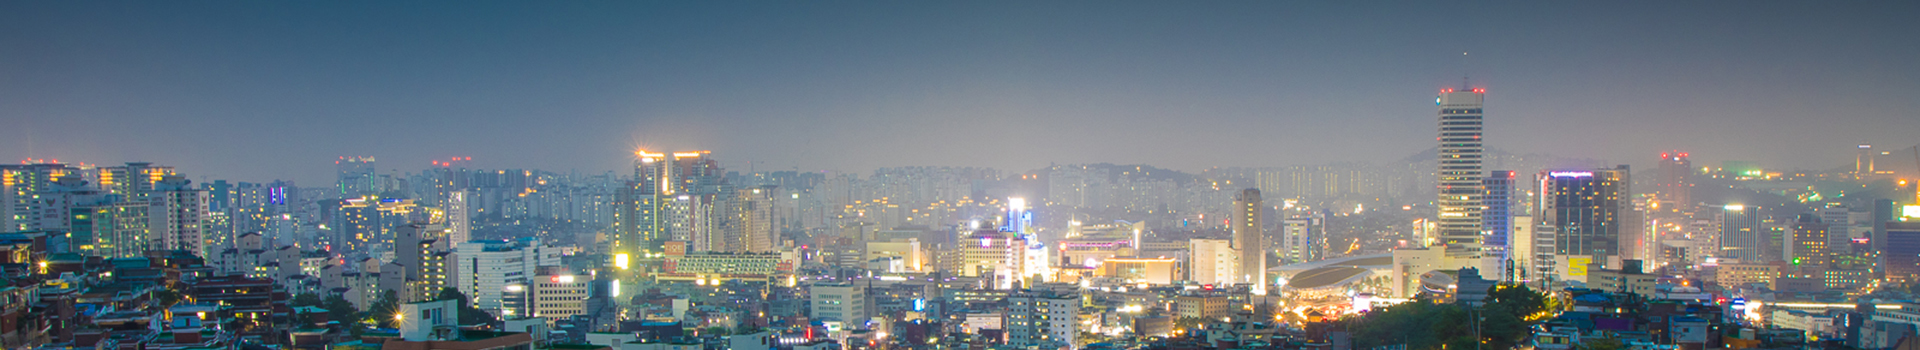 Летние краски Кореи:<br>Сеул, Пусан, Сеул